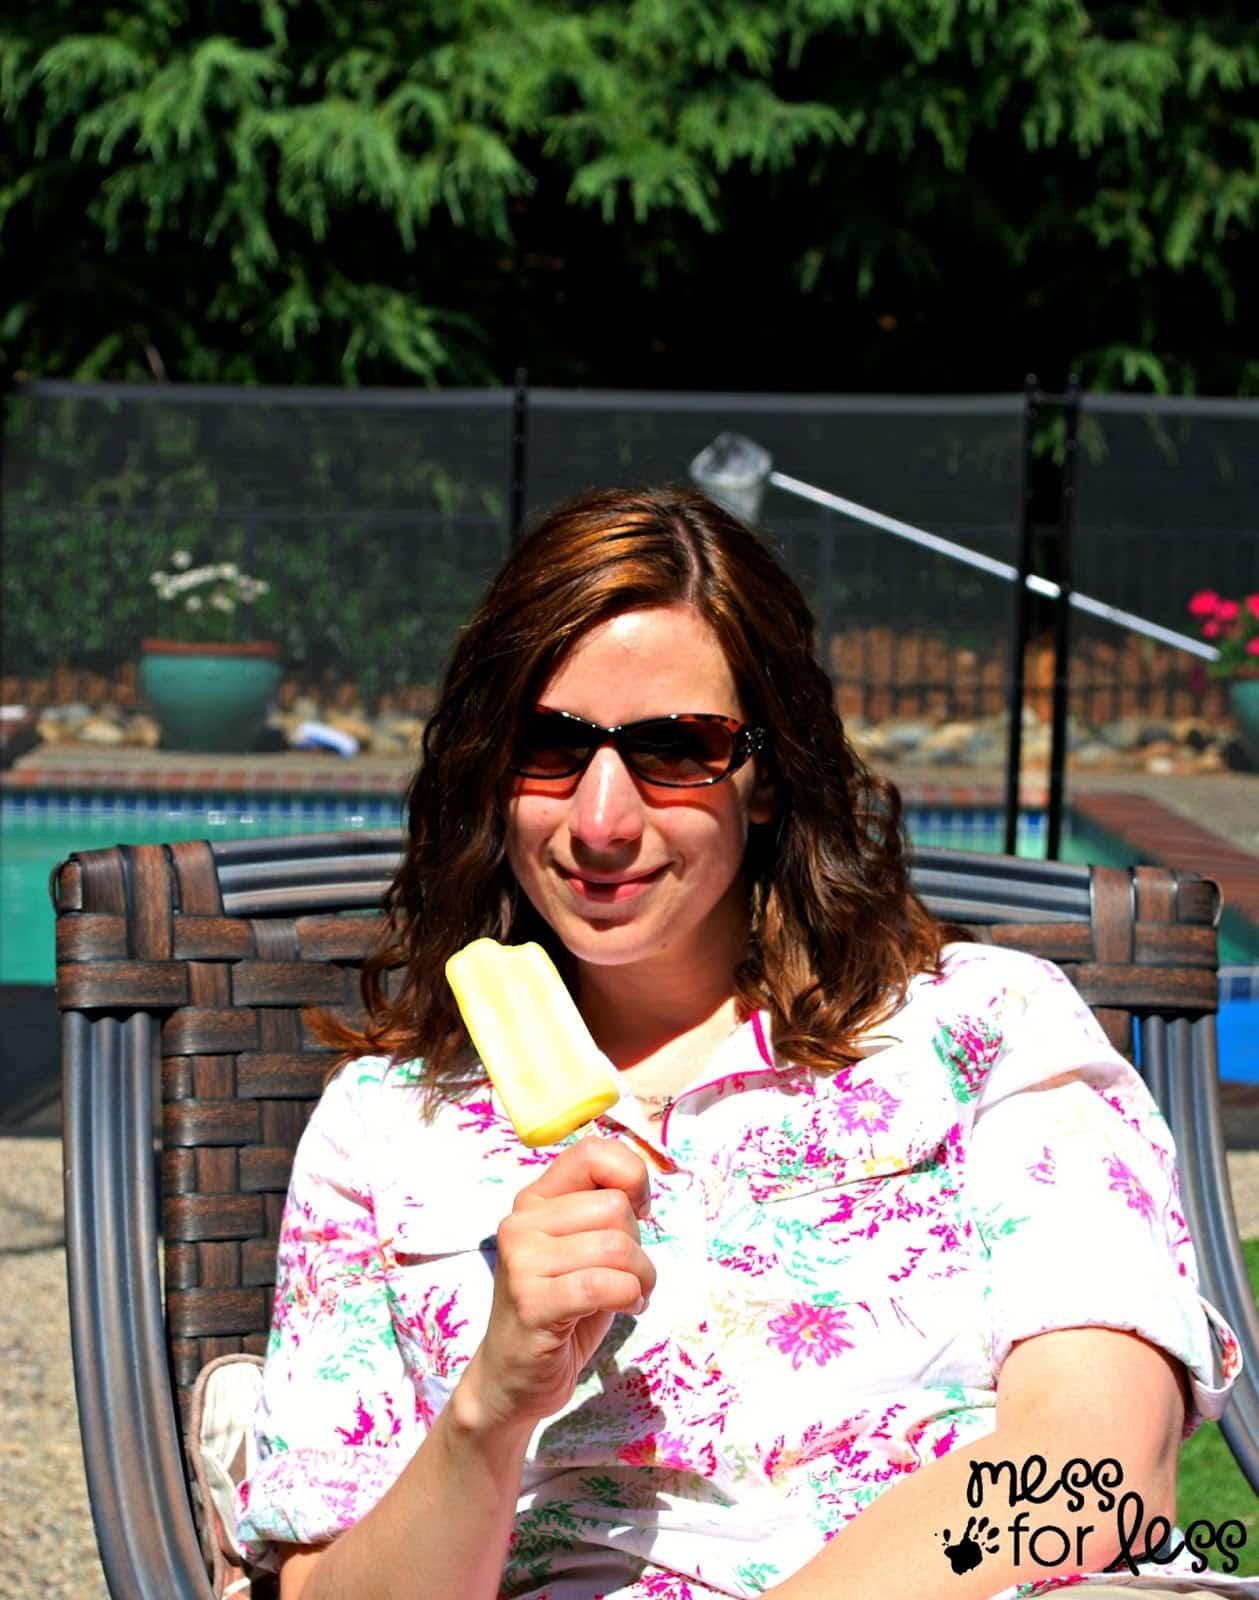 Pineapple flavored Edy's Outshine Bars. #shop #SummerGoodies #cbias